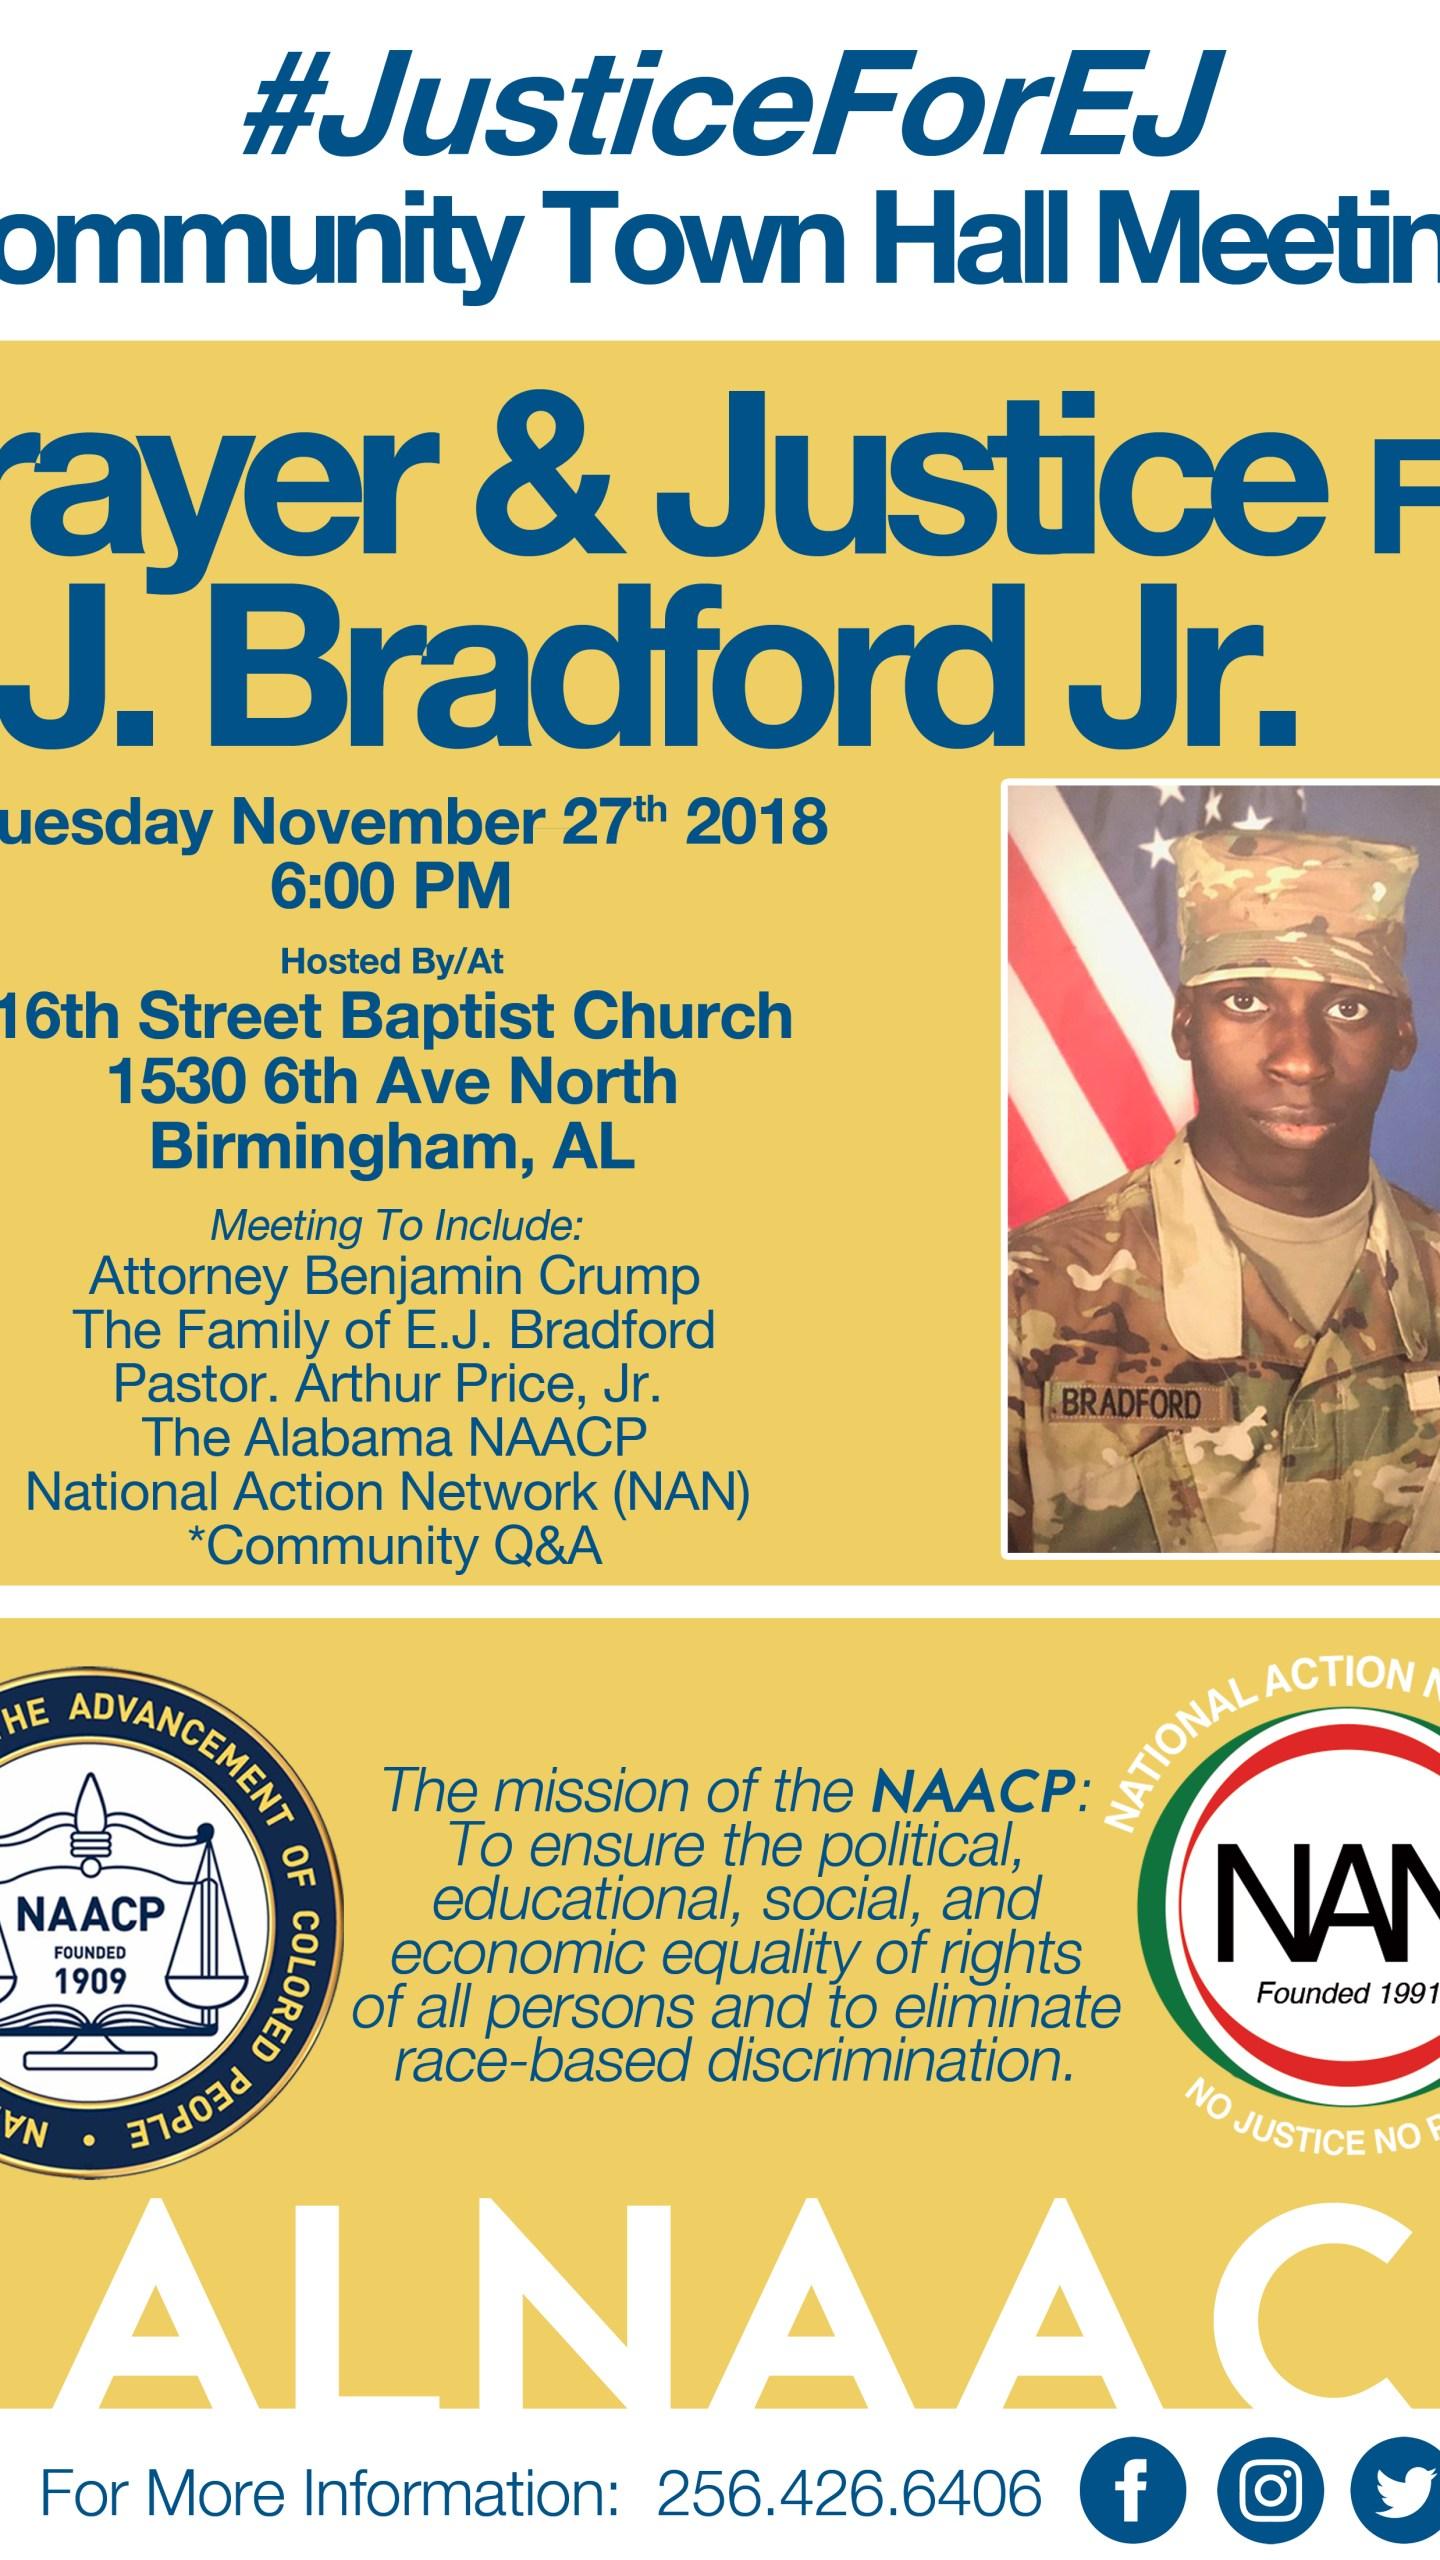 Prayer & Justice for EJ. Bradford Jr. Flier